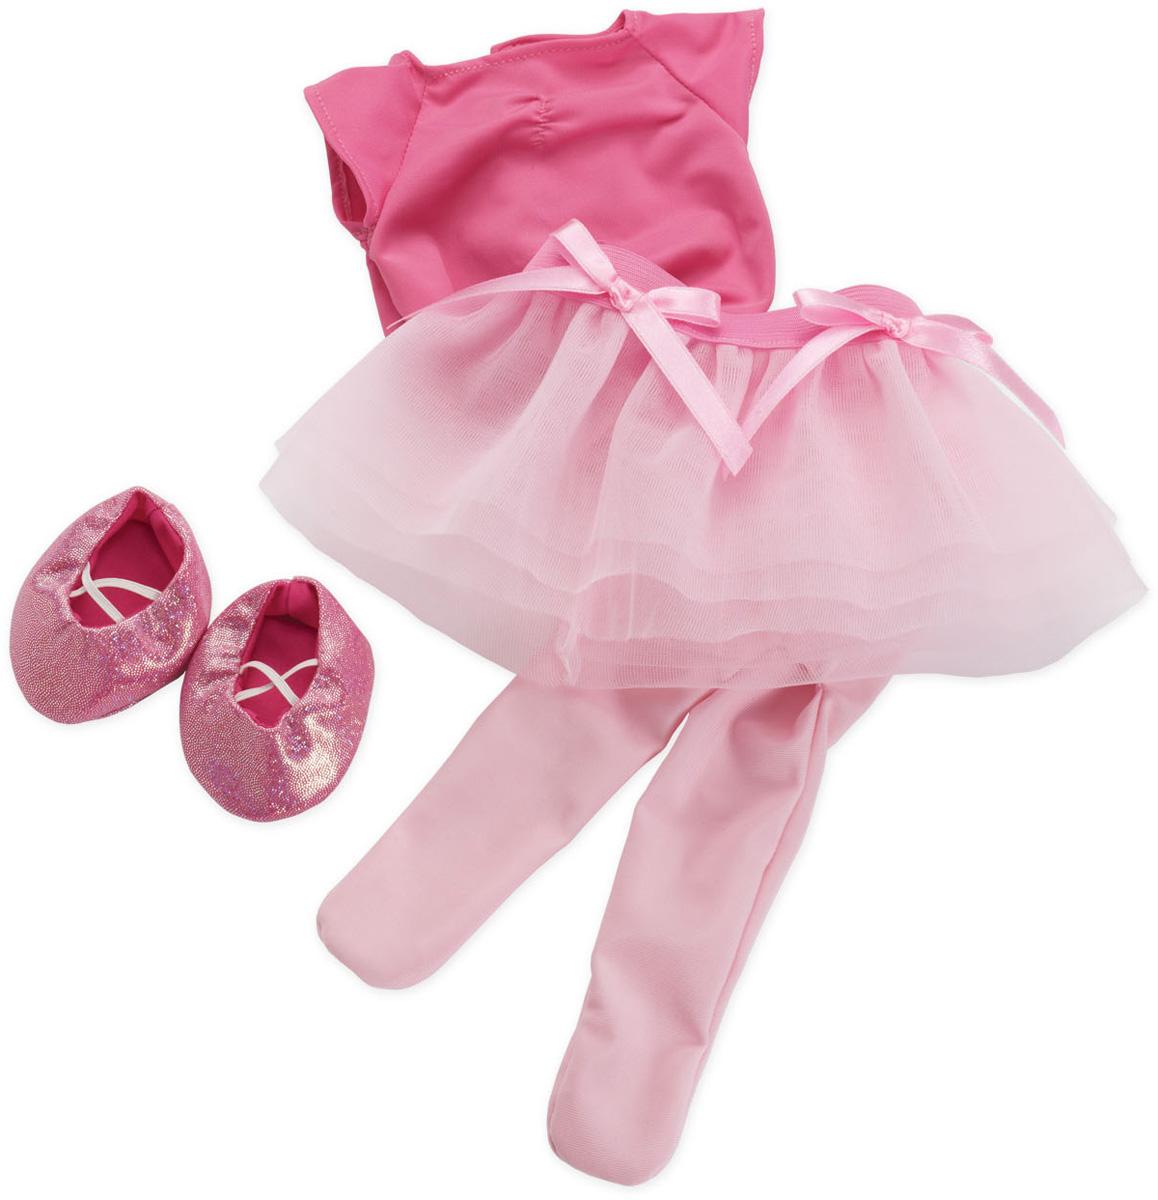 Manhattan Toy Baby Stella Outfit Tiptoe Ballet Tutu Doll